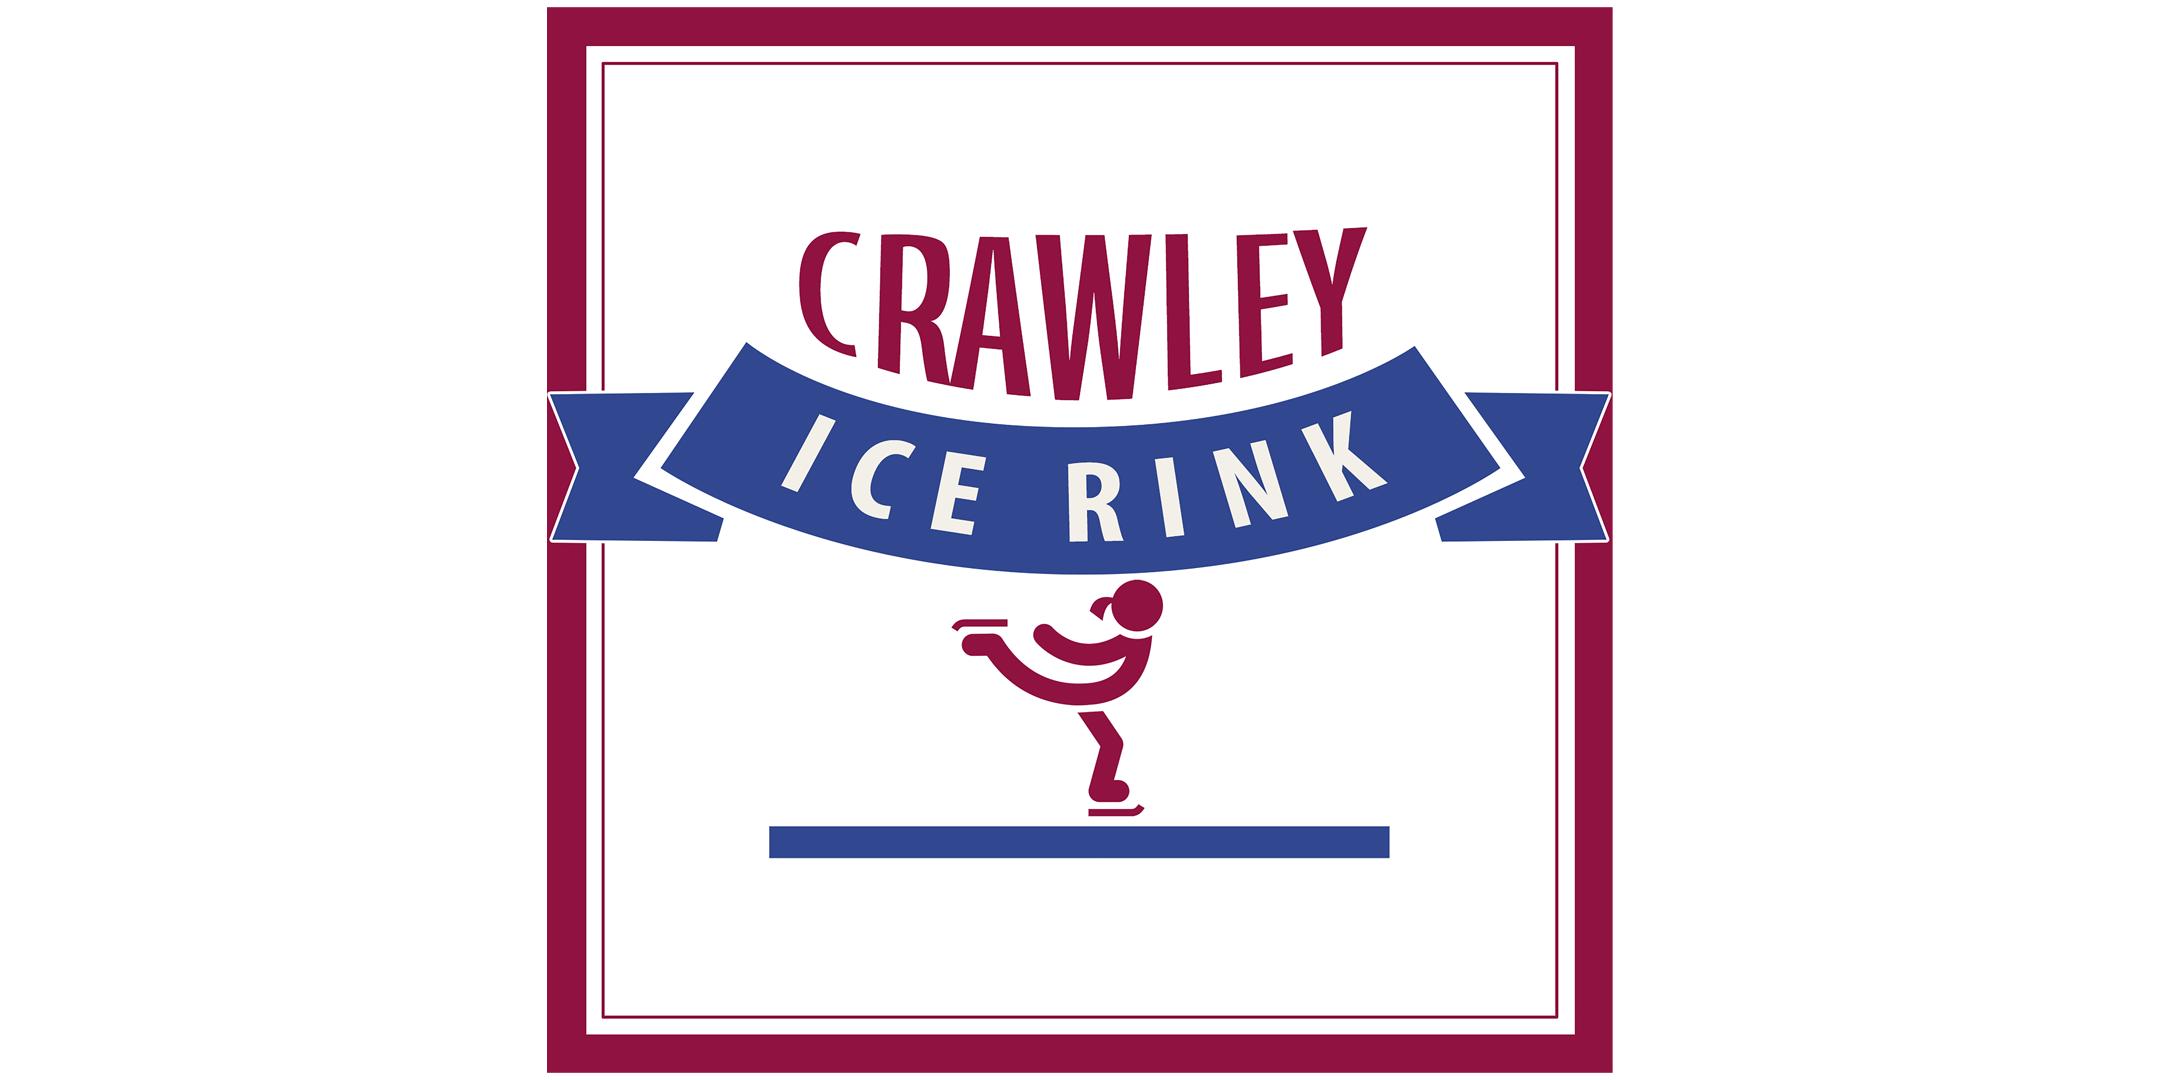 Crawley Ice Rink - 26th December (Peak)